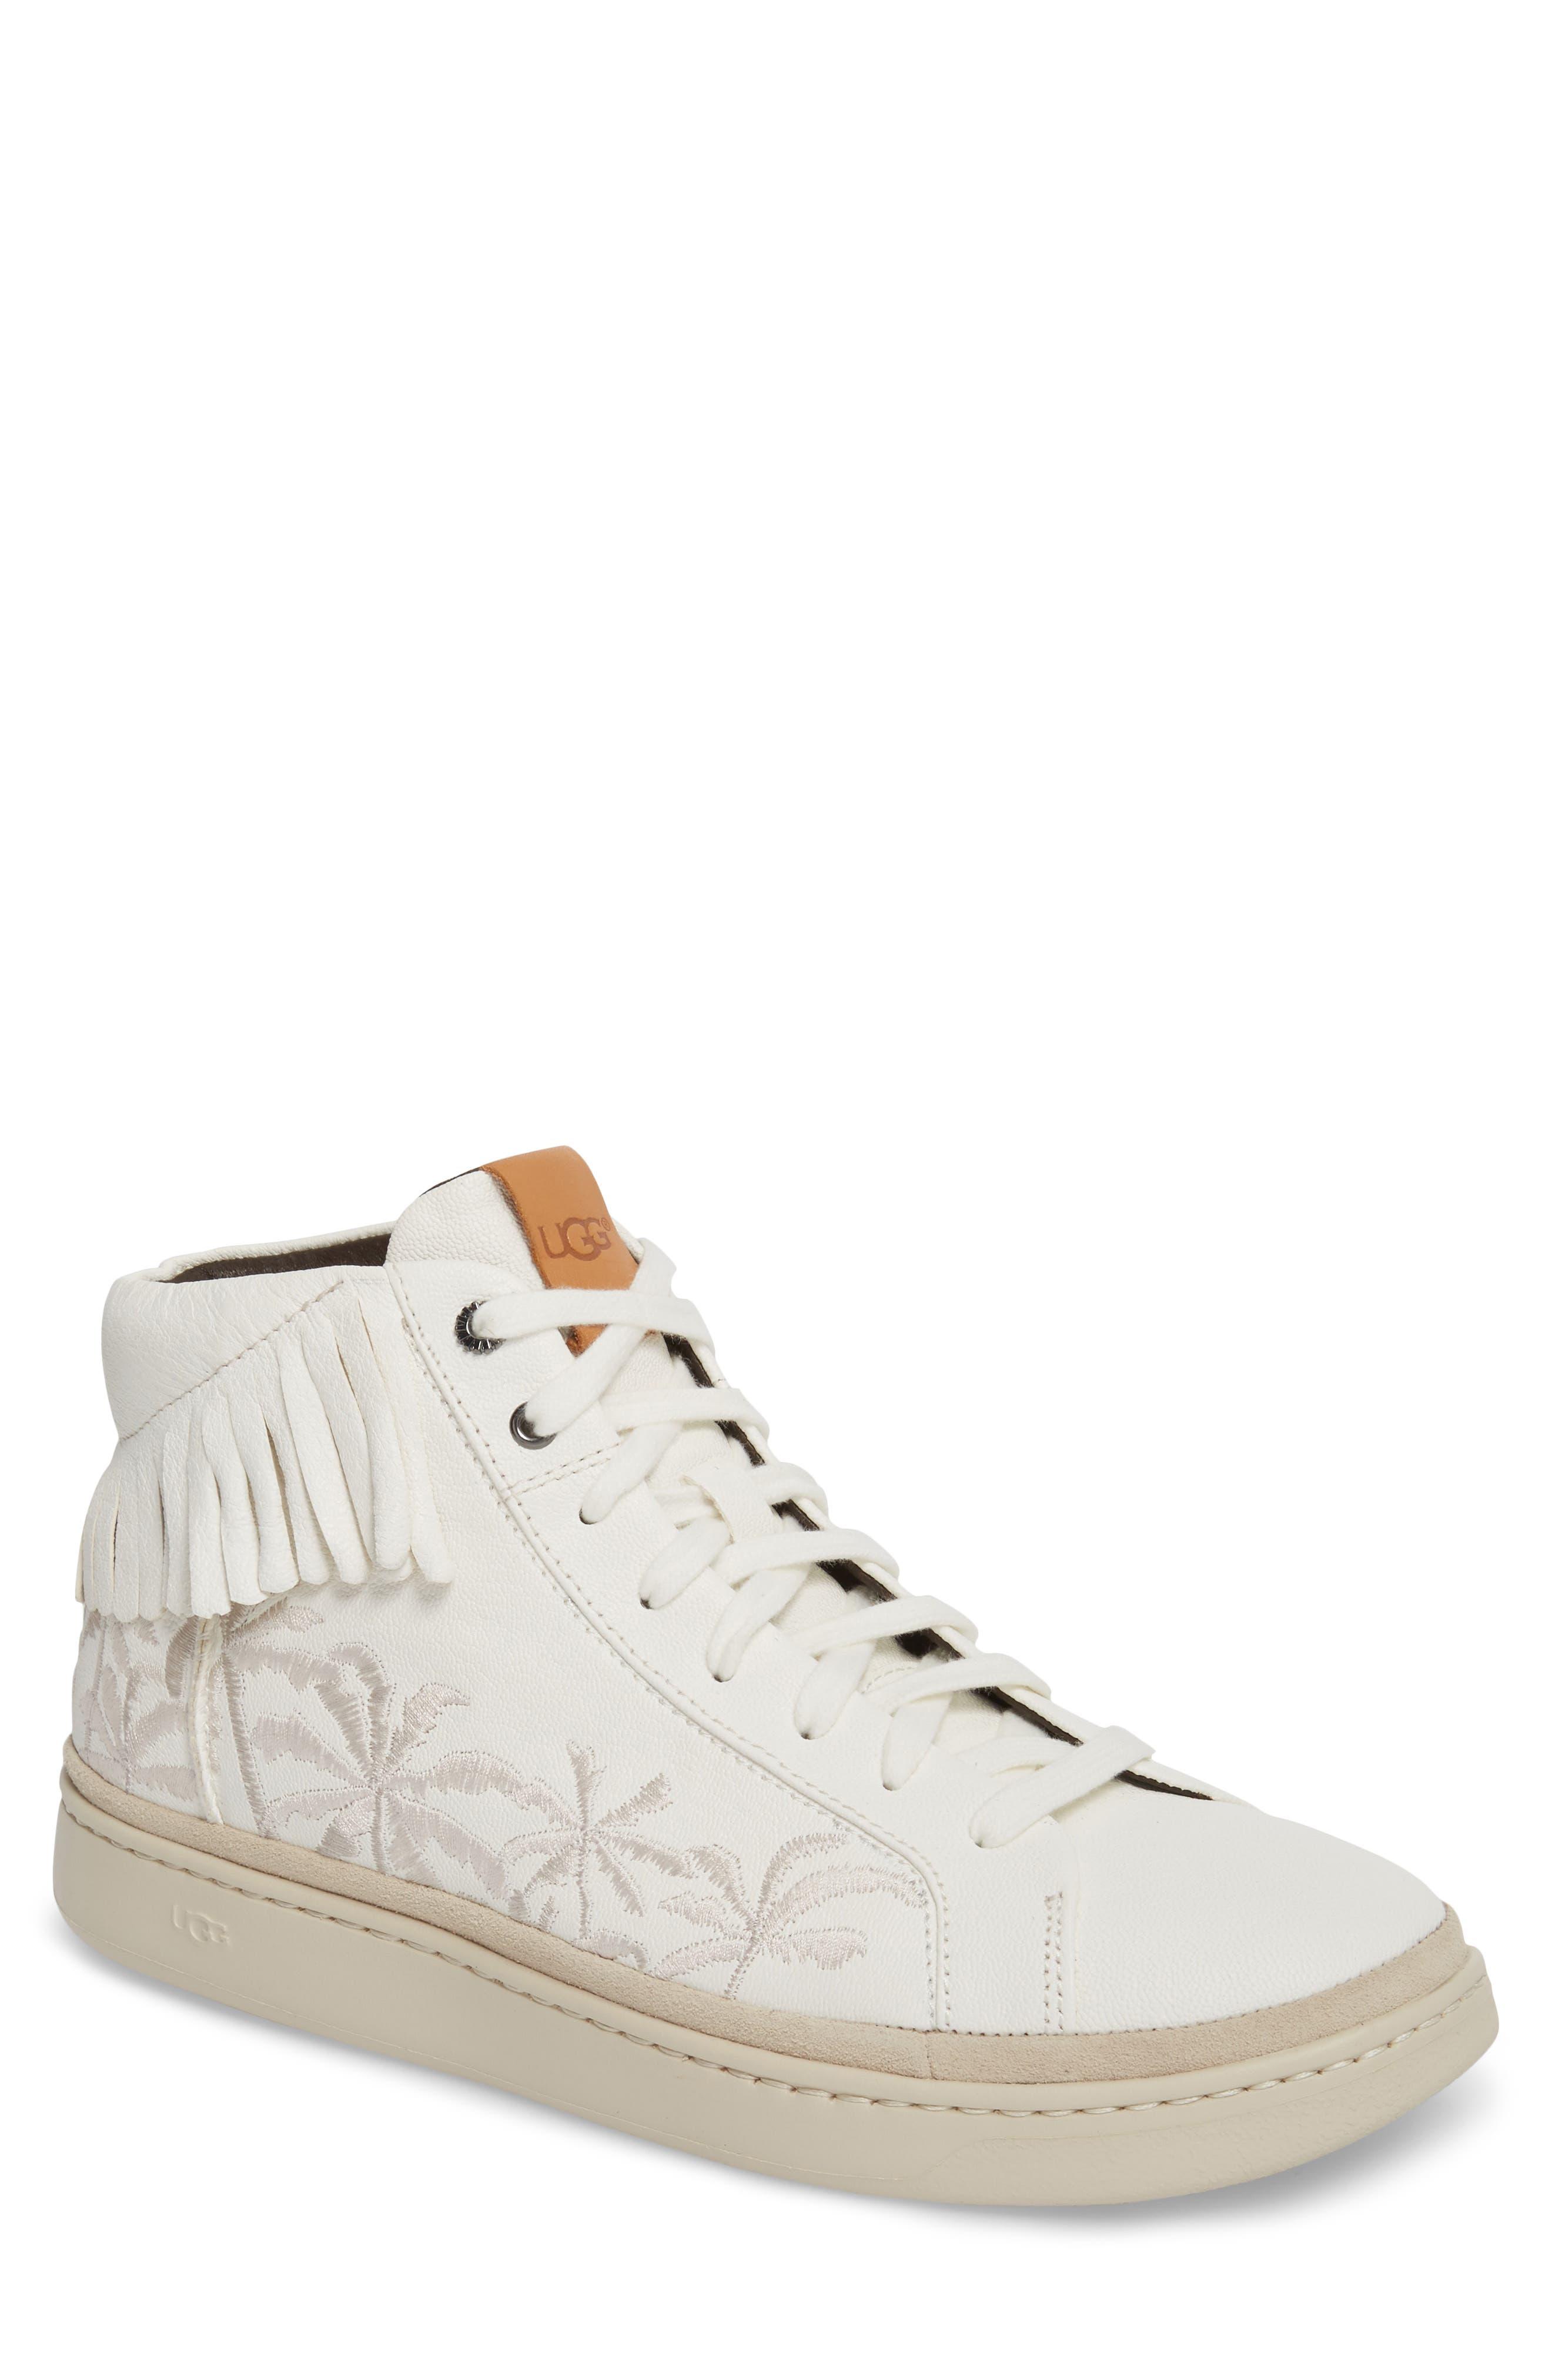 Cali Fringe High Top Sneaker,                         Main,                         color, 100